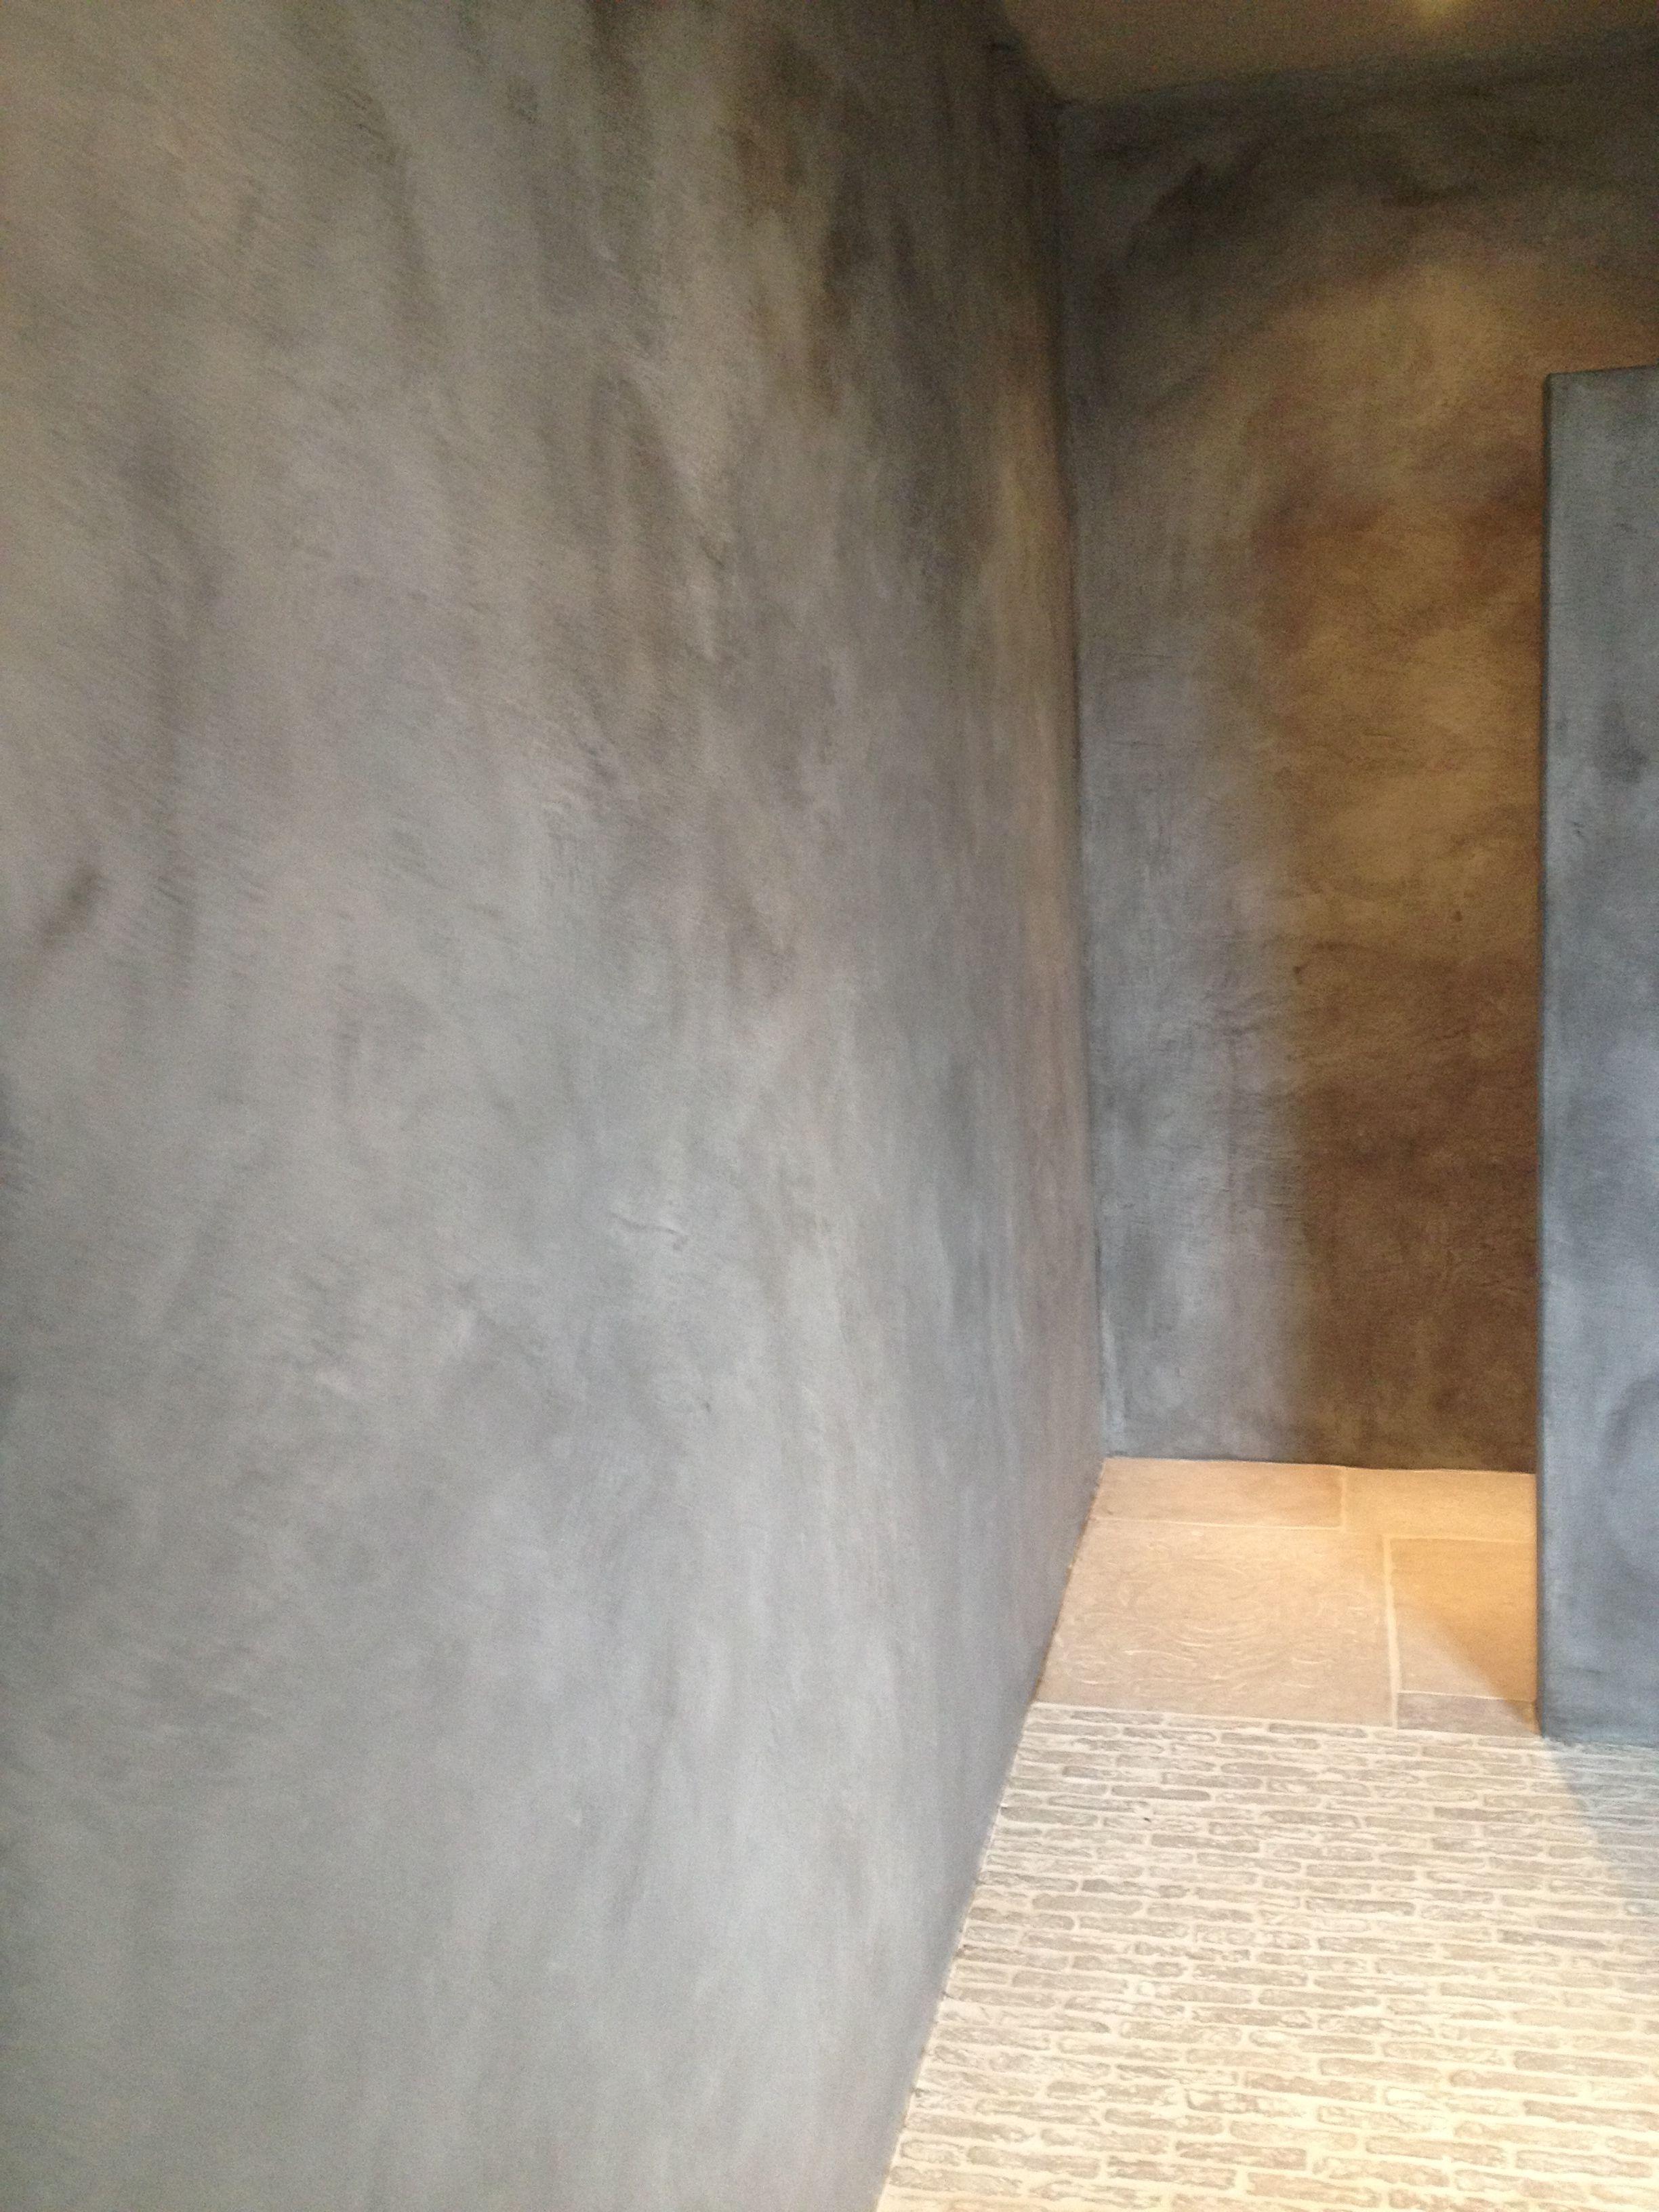 Badkamer, andere kleur muur, maar combi tussen betonlook muur en ...